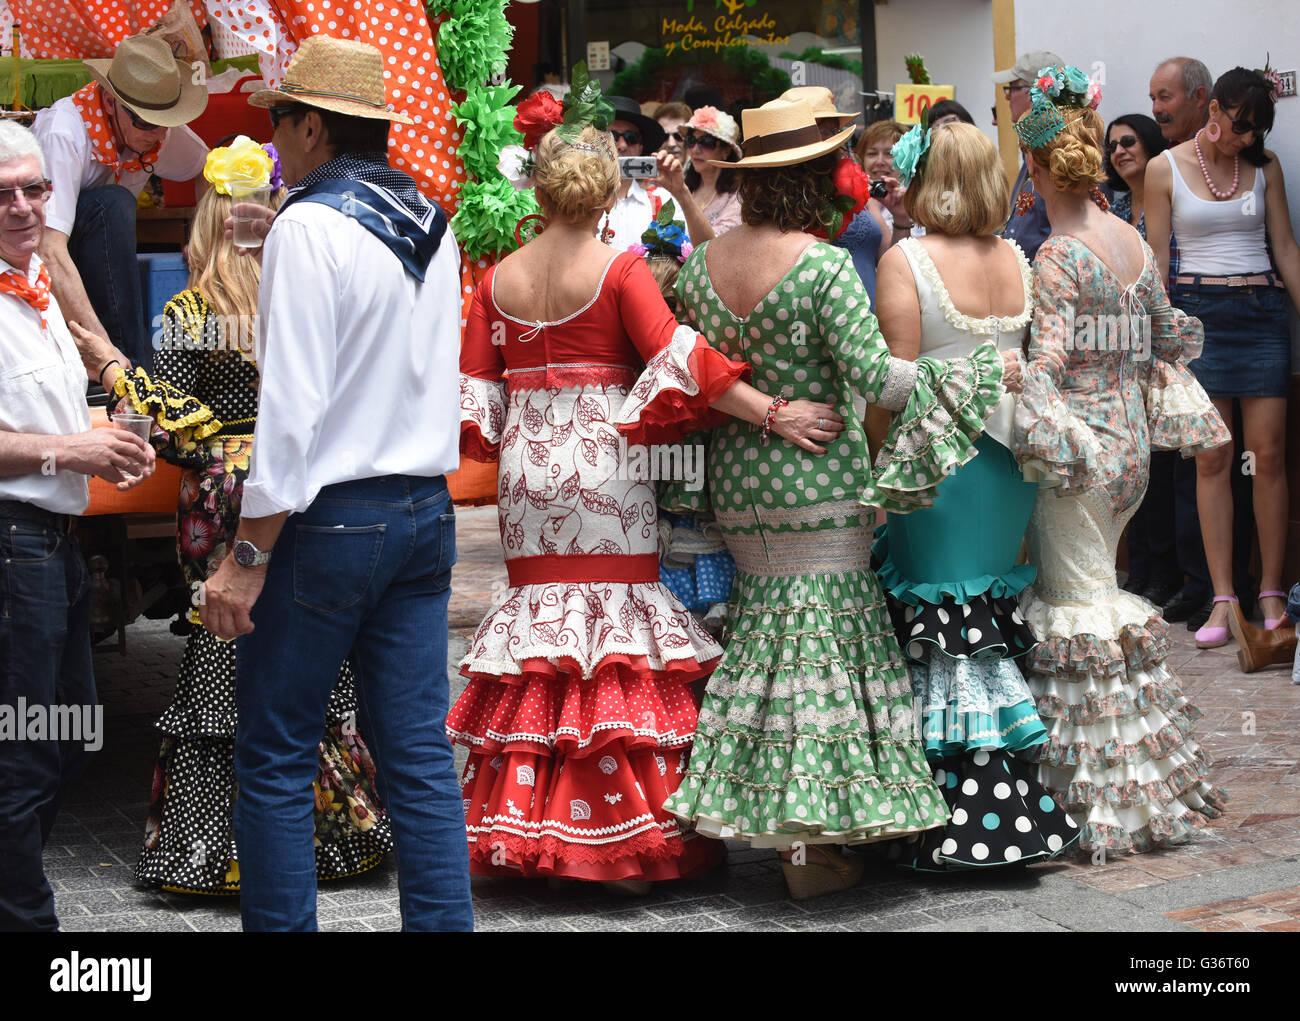 Frauen gekleidet in traditionellen Kostümen bei San Isidro Festival Fiesta in Nerja Andalucia Spanien Stockbild